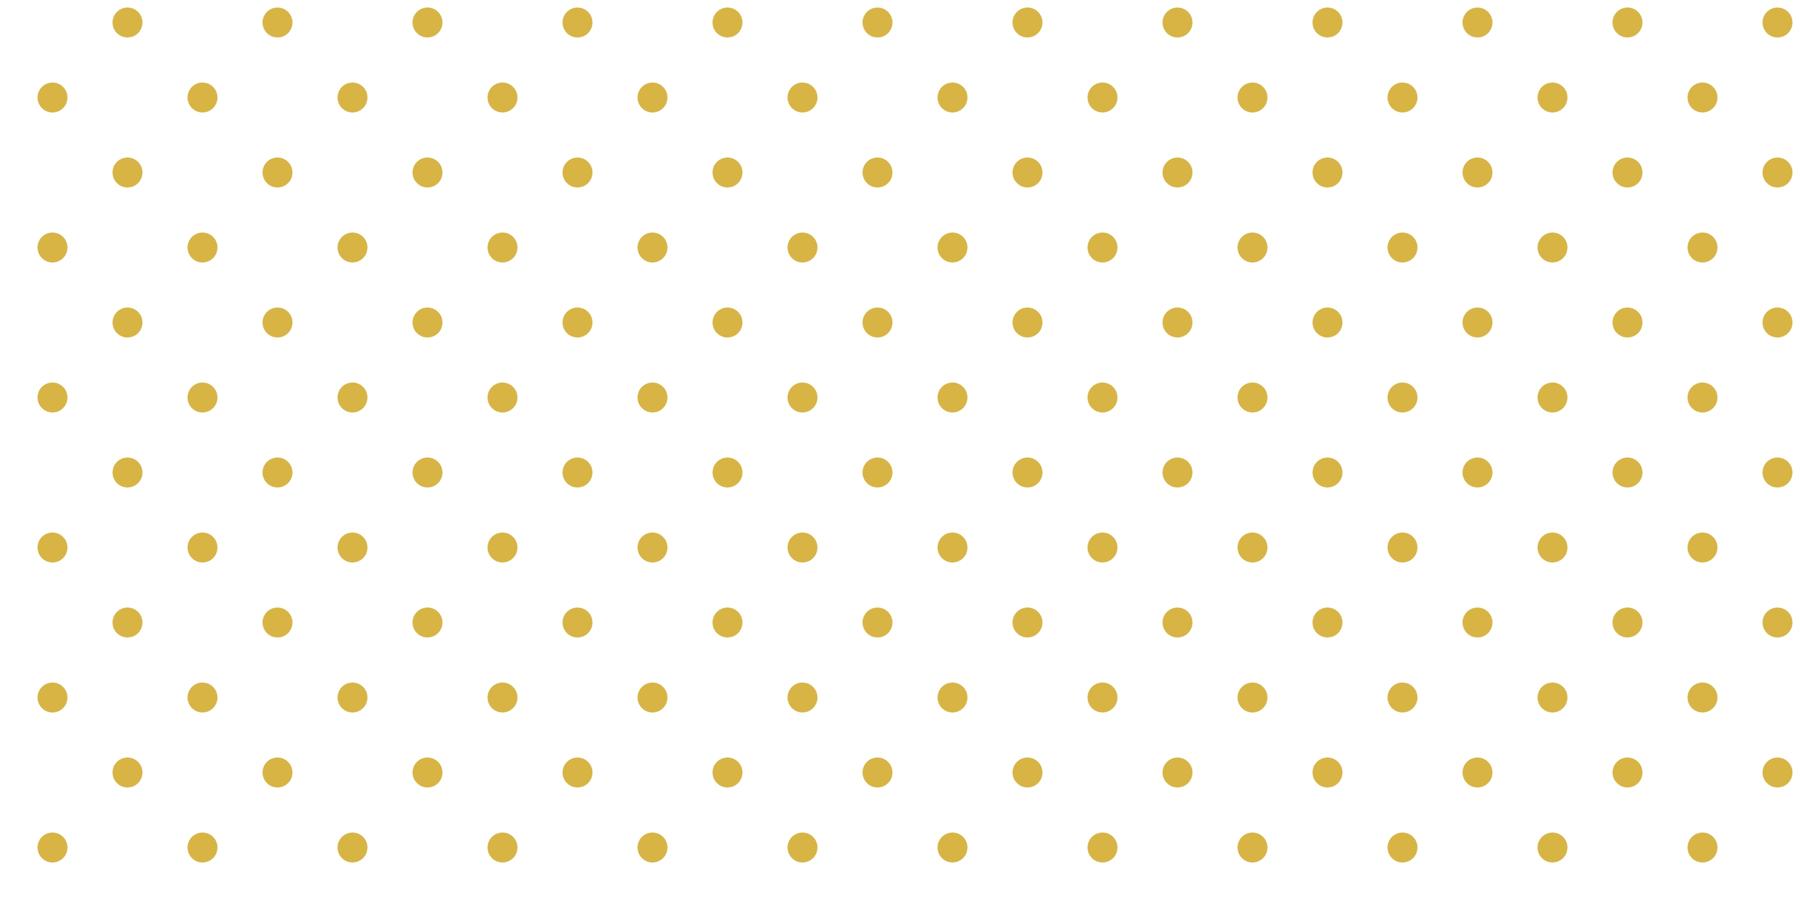 Dots clipart gold dot Green clipart dots clipart polka